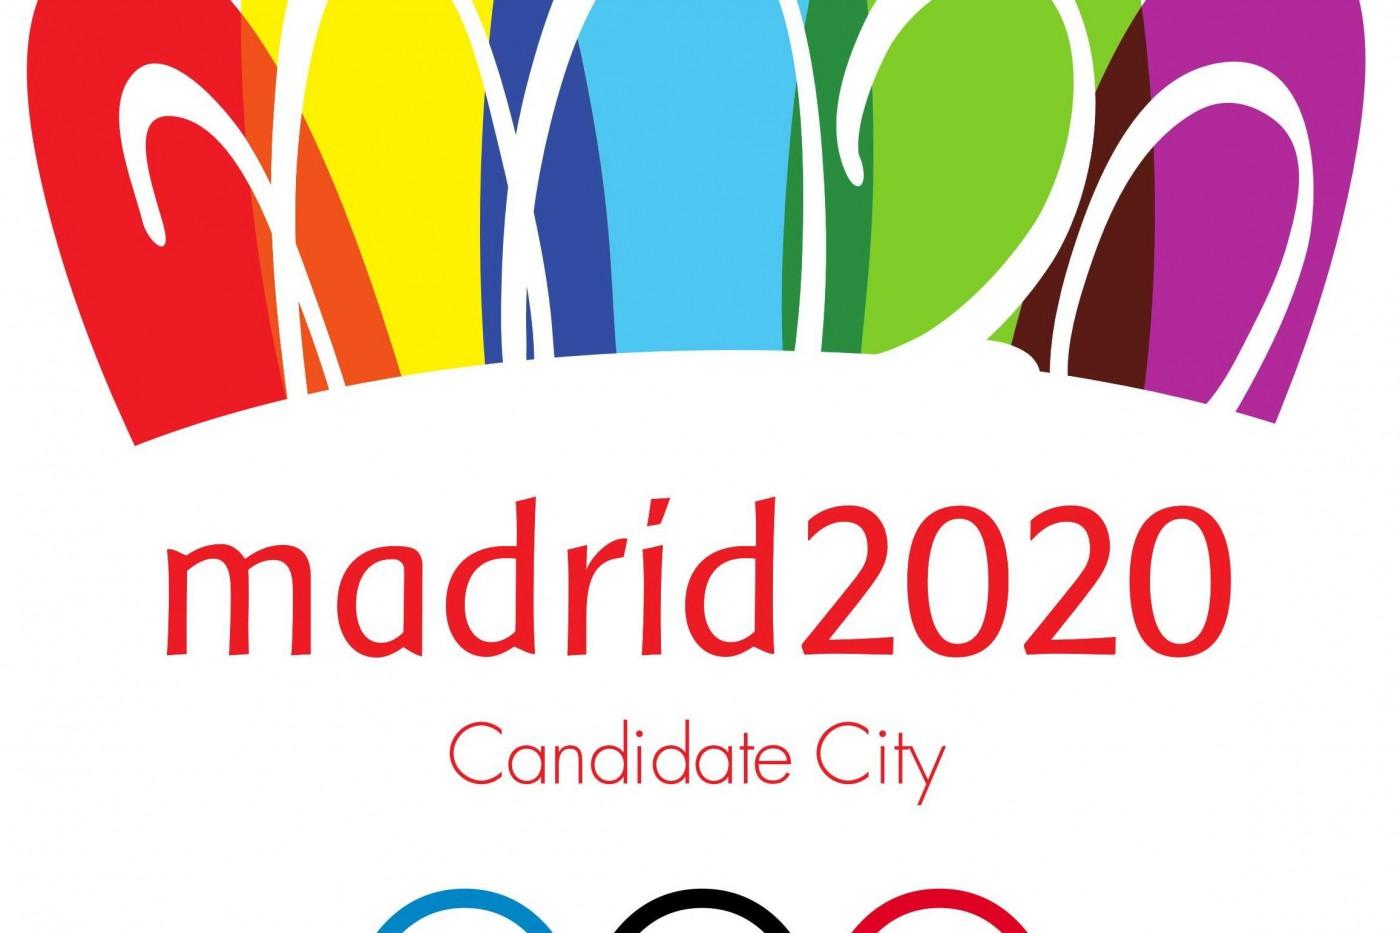 Madrid_2020_Olympic_logo